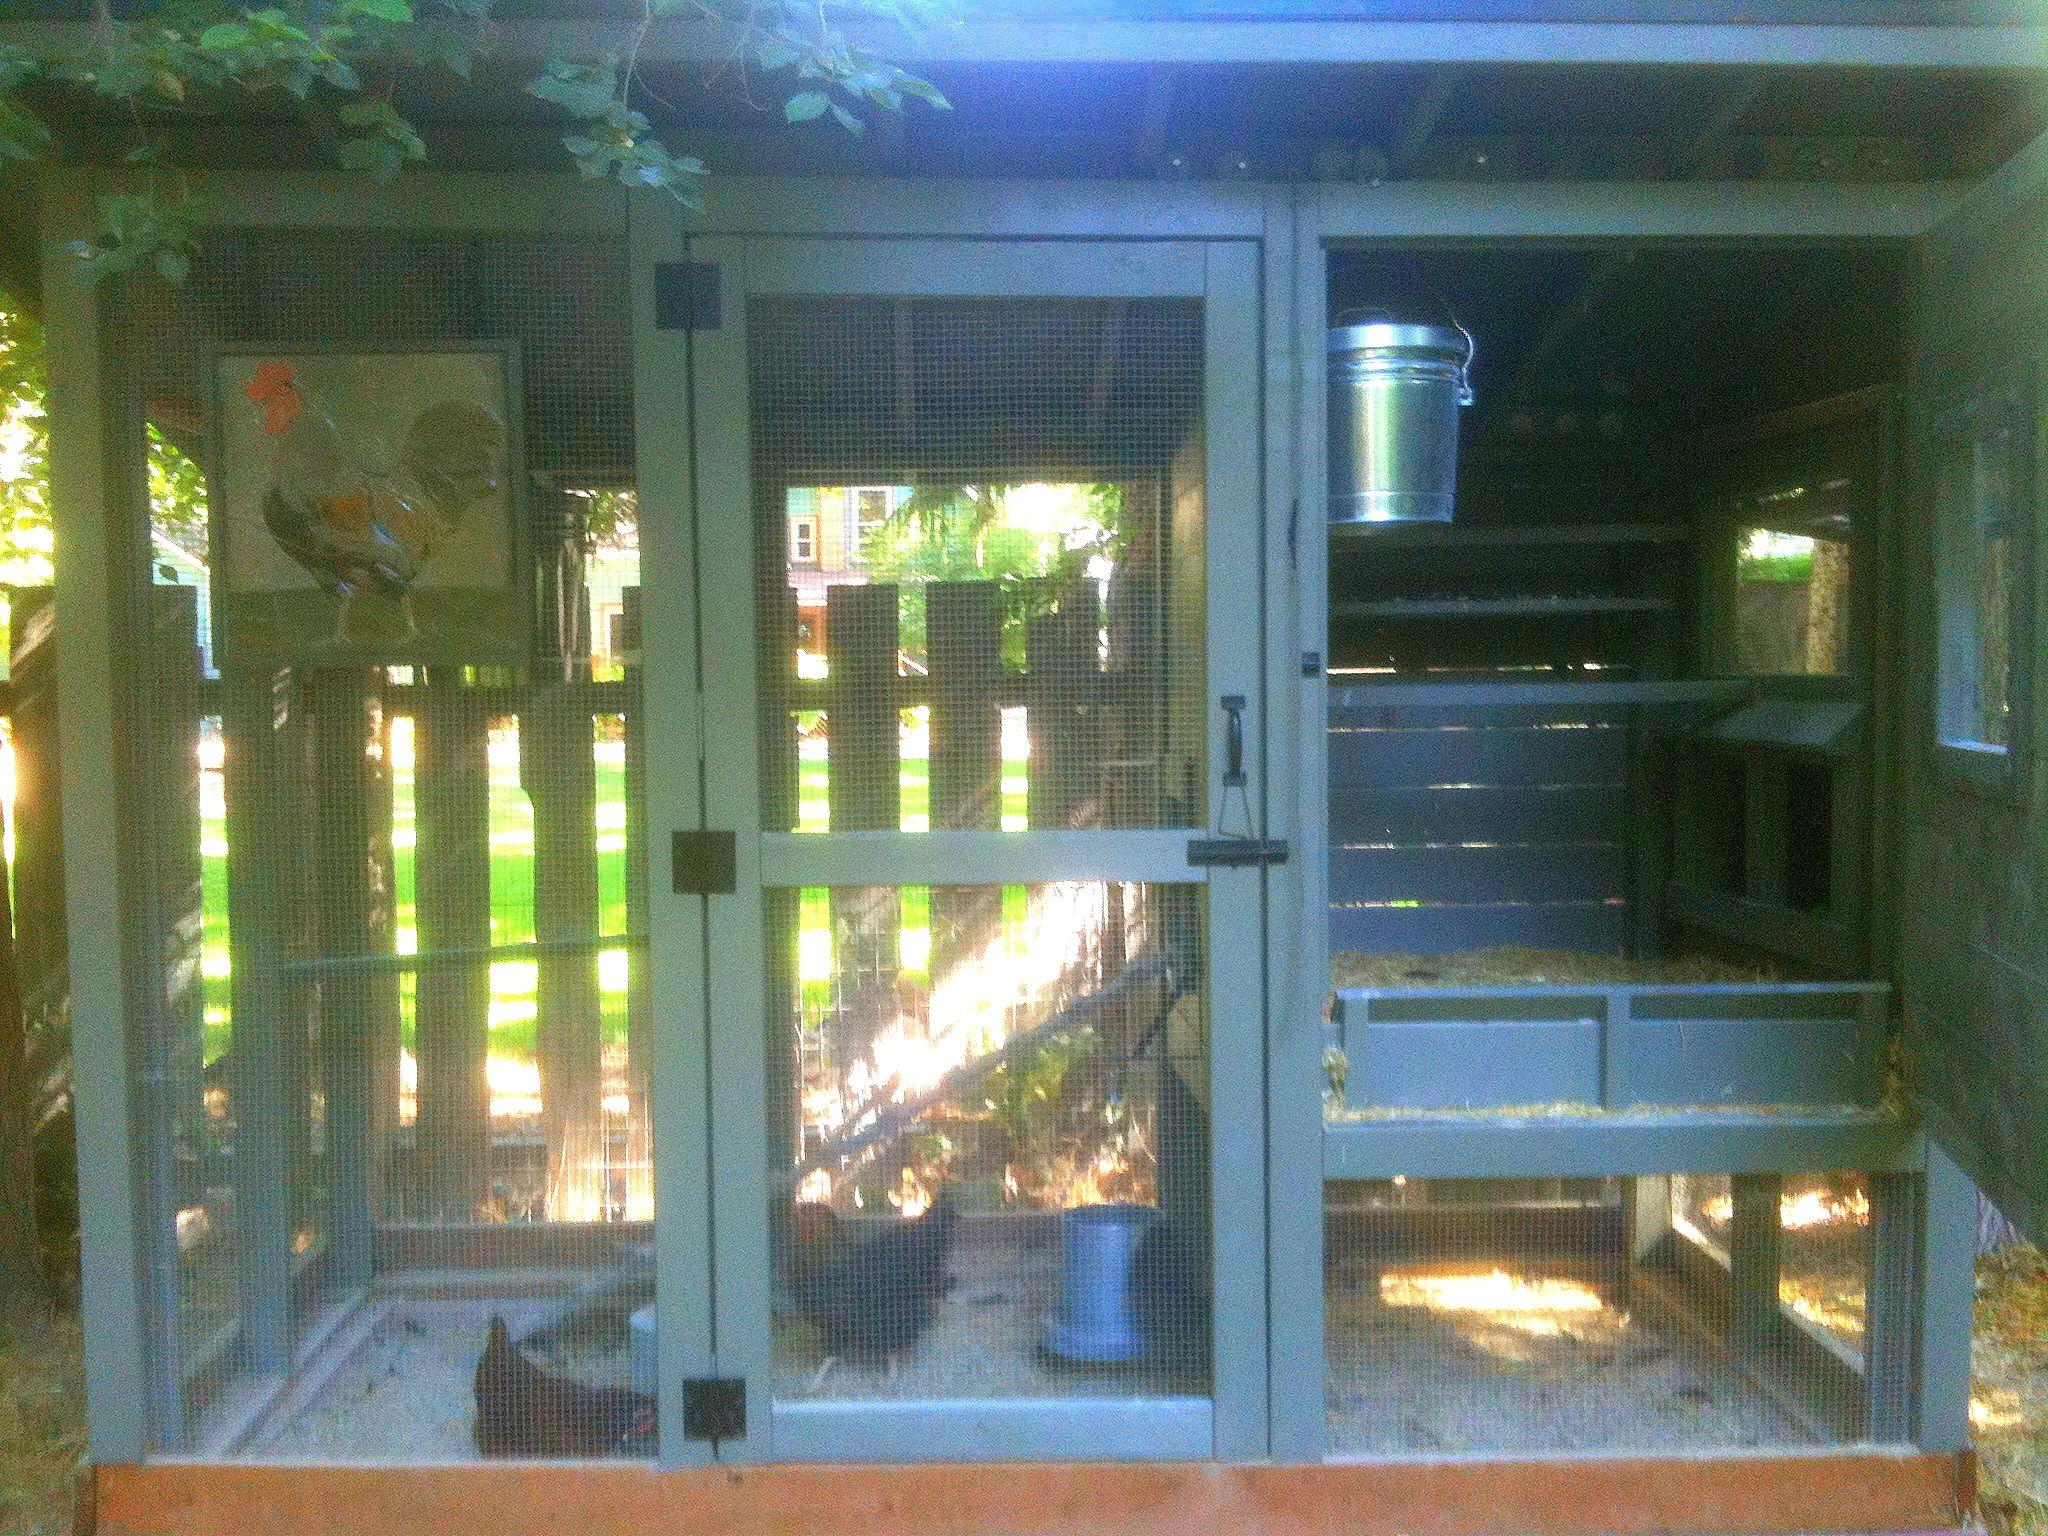 raising backyard chickens diy chicken coop coops and backyard